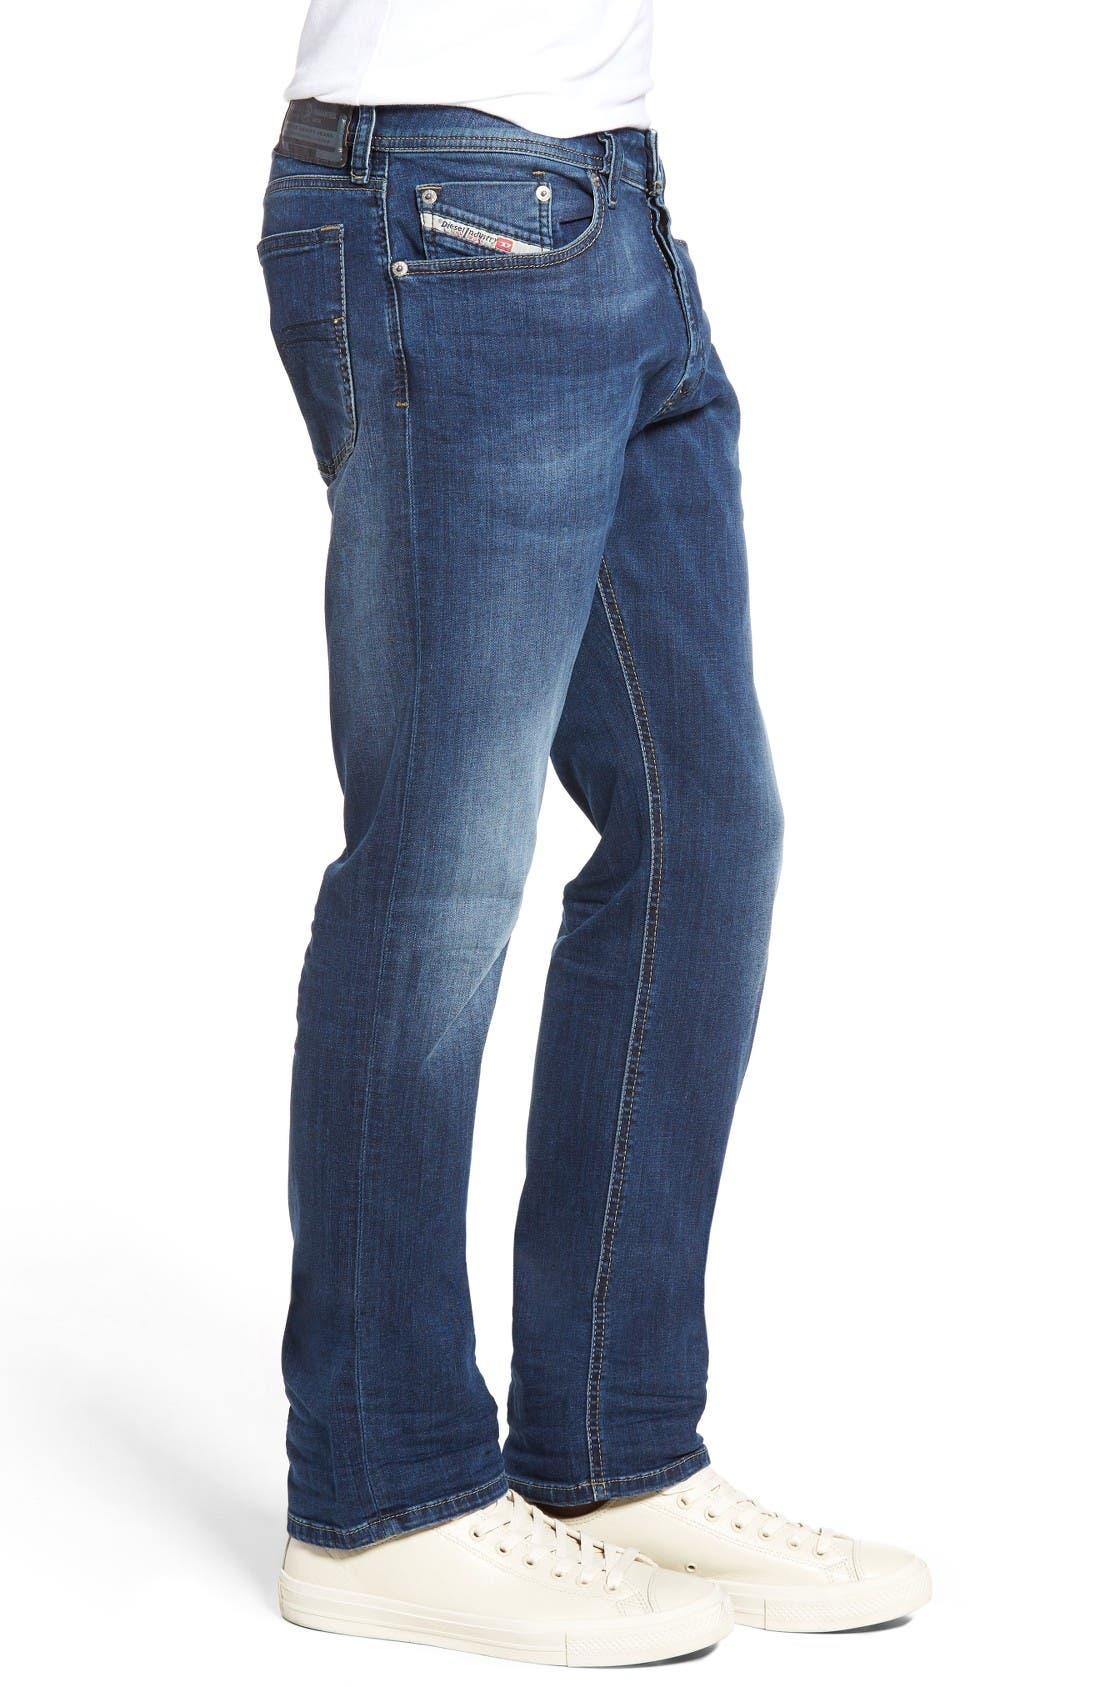 Waykee Straight Leg Jeans,                             Alternate thumbnail 3, color,                             0679I